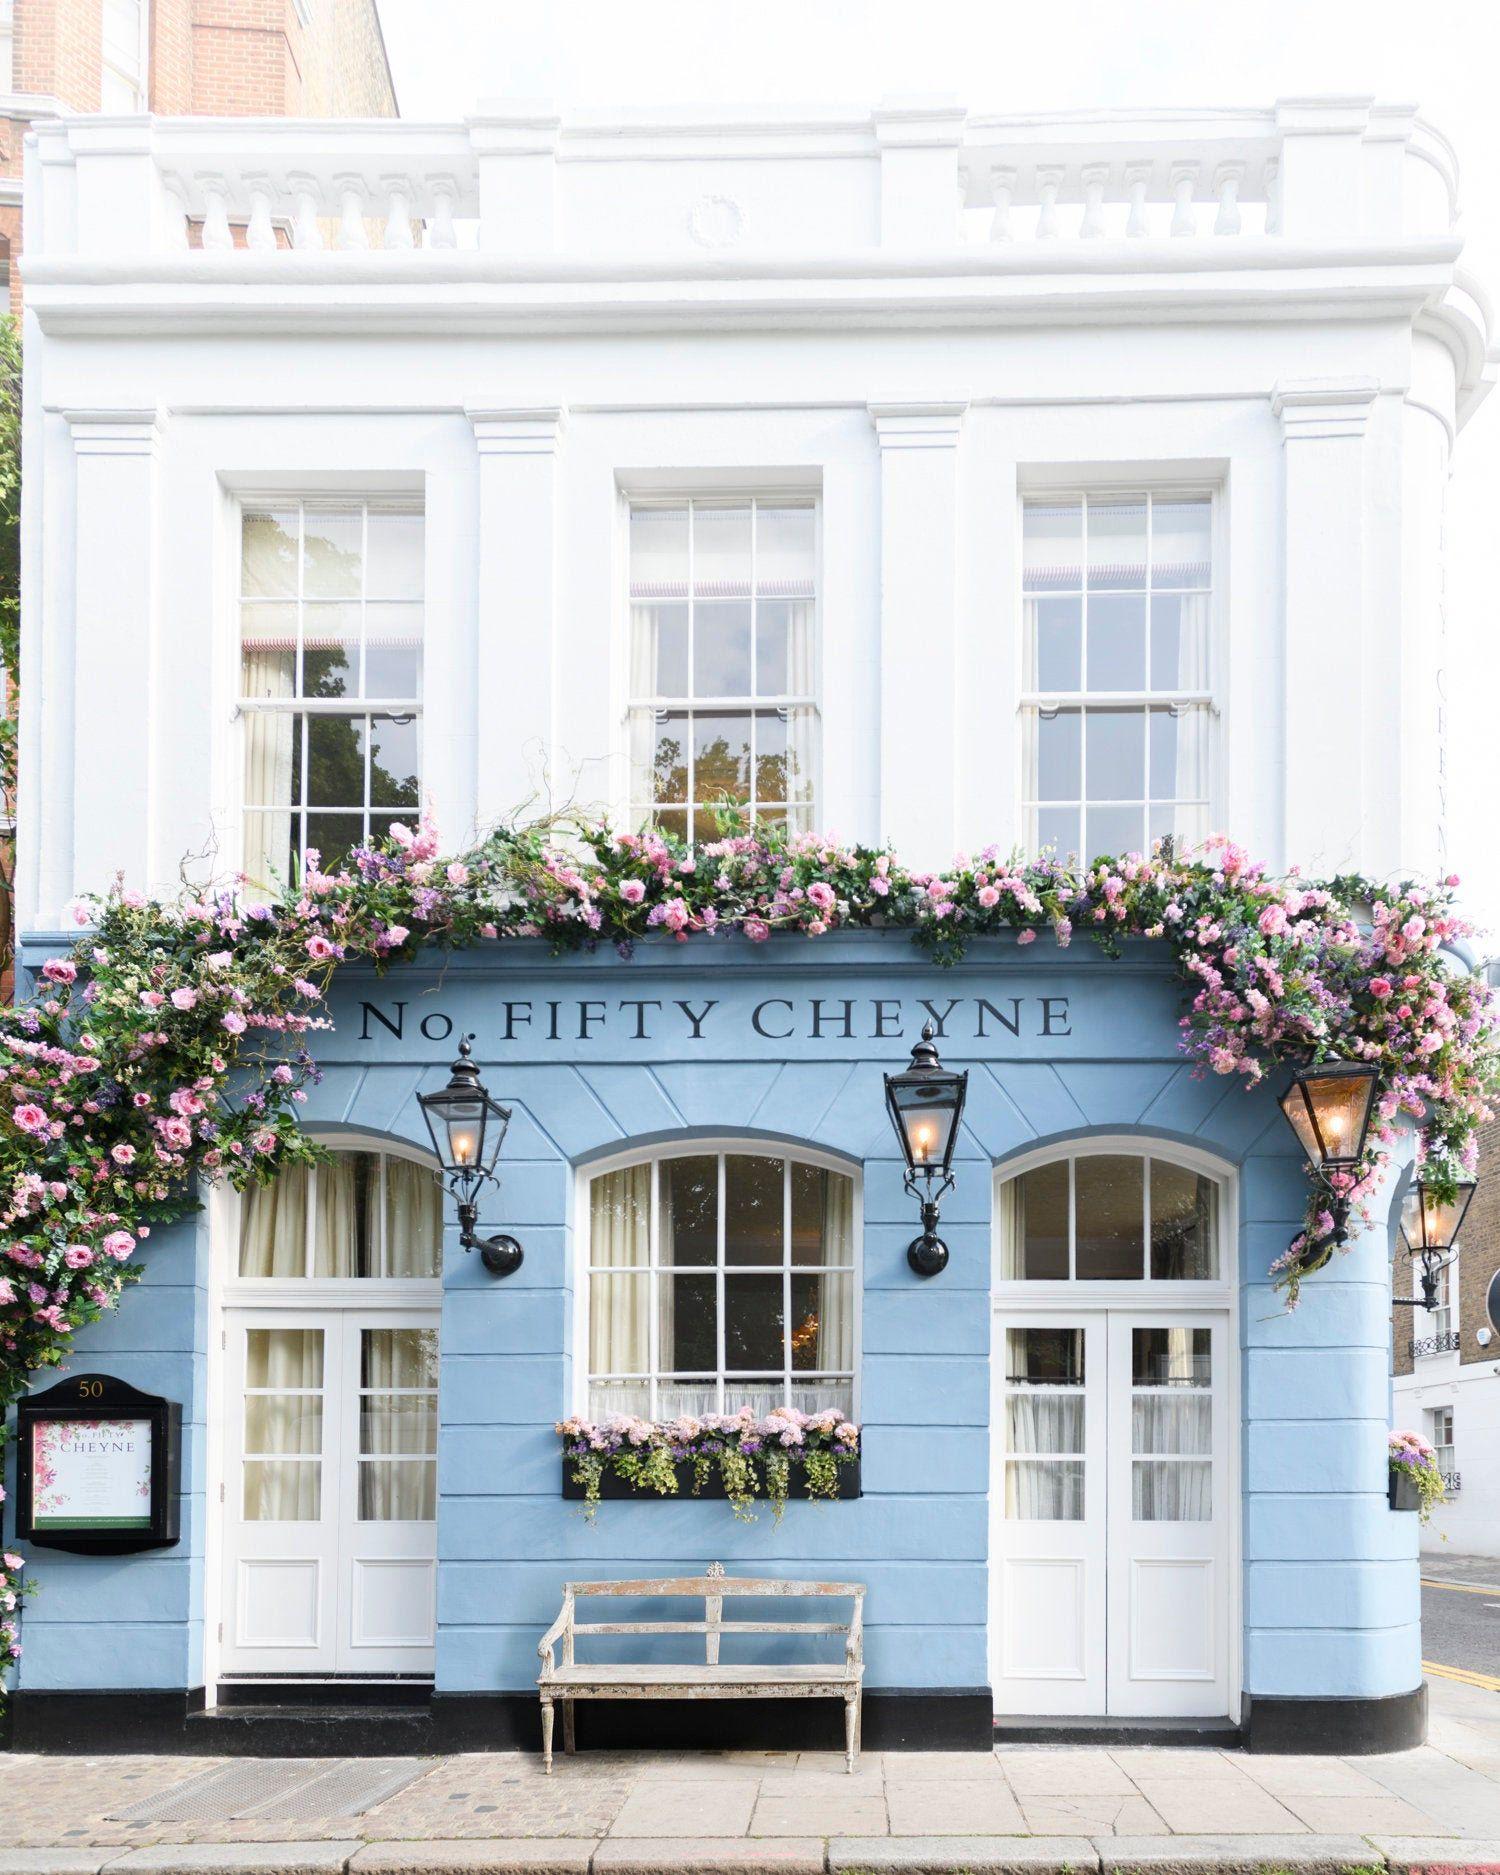 London Photograph Number Fifty Cheyne Walk Chelsea England Etsy Storefront Design Cafe Interior Design Cafe Design